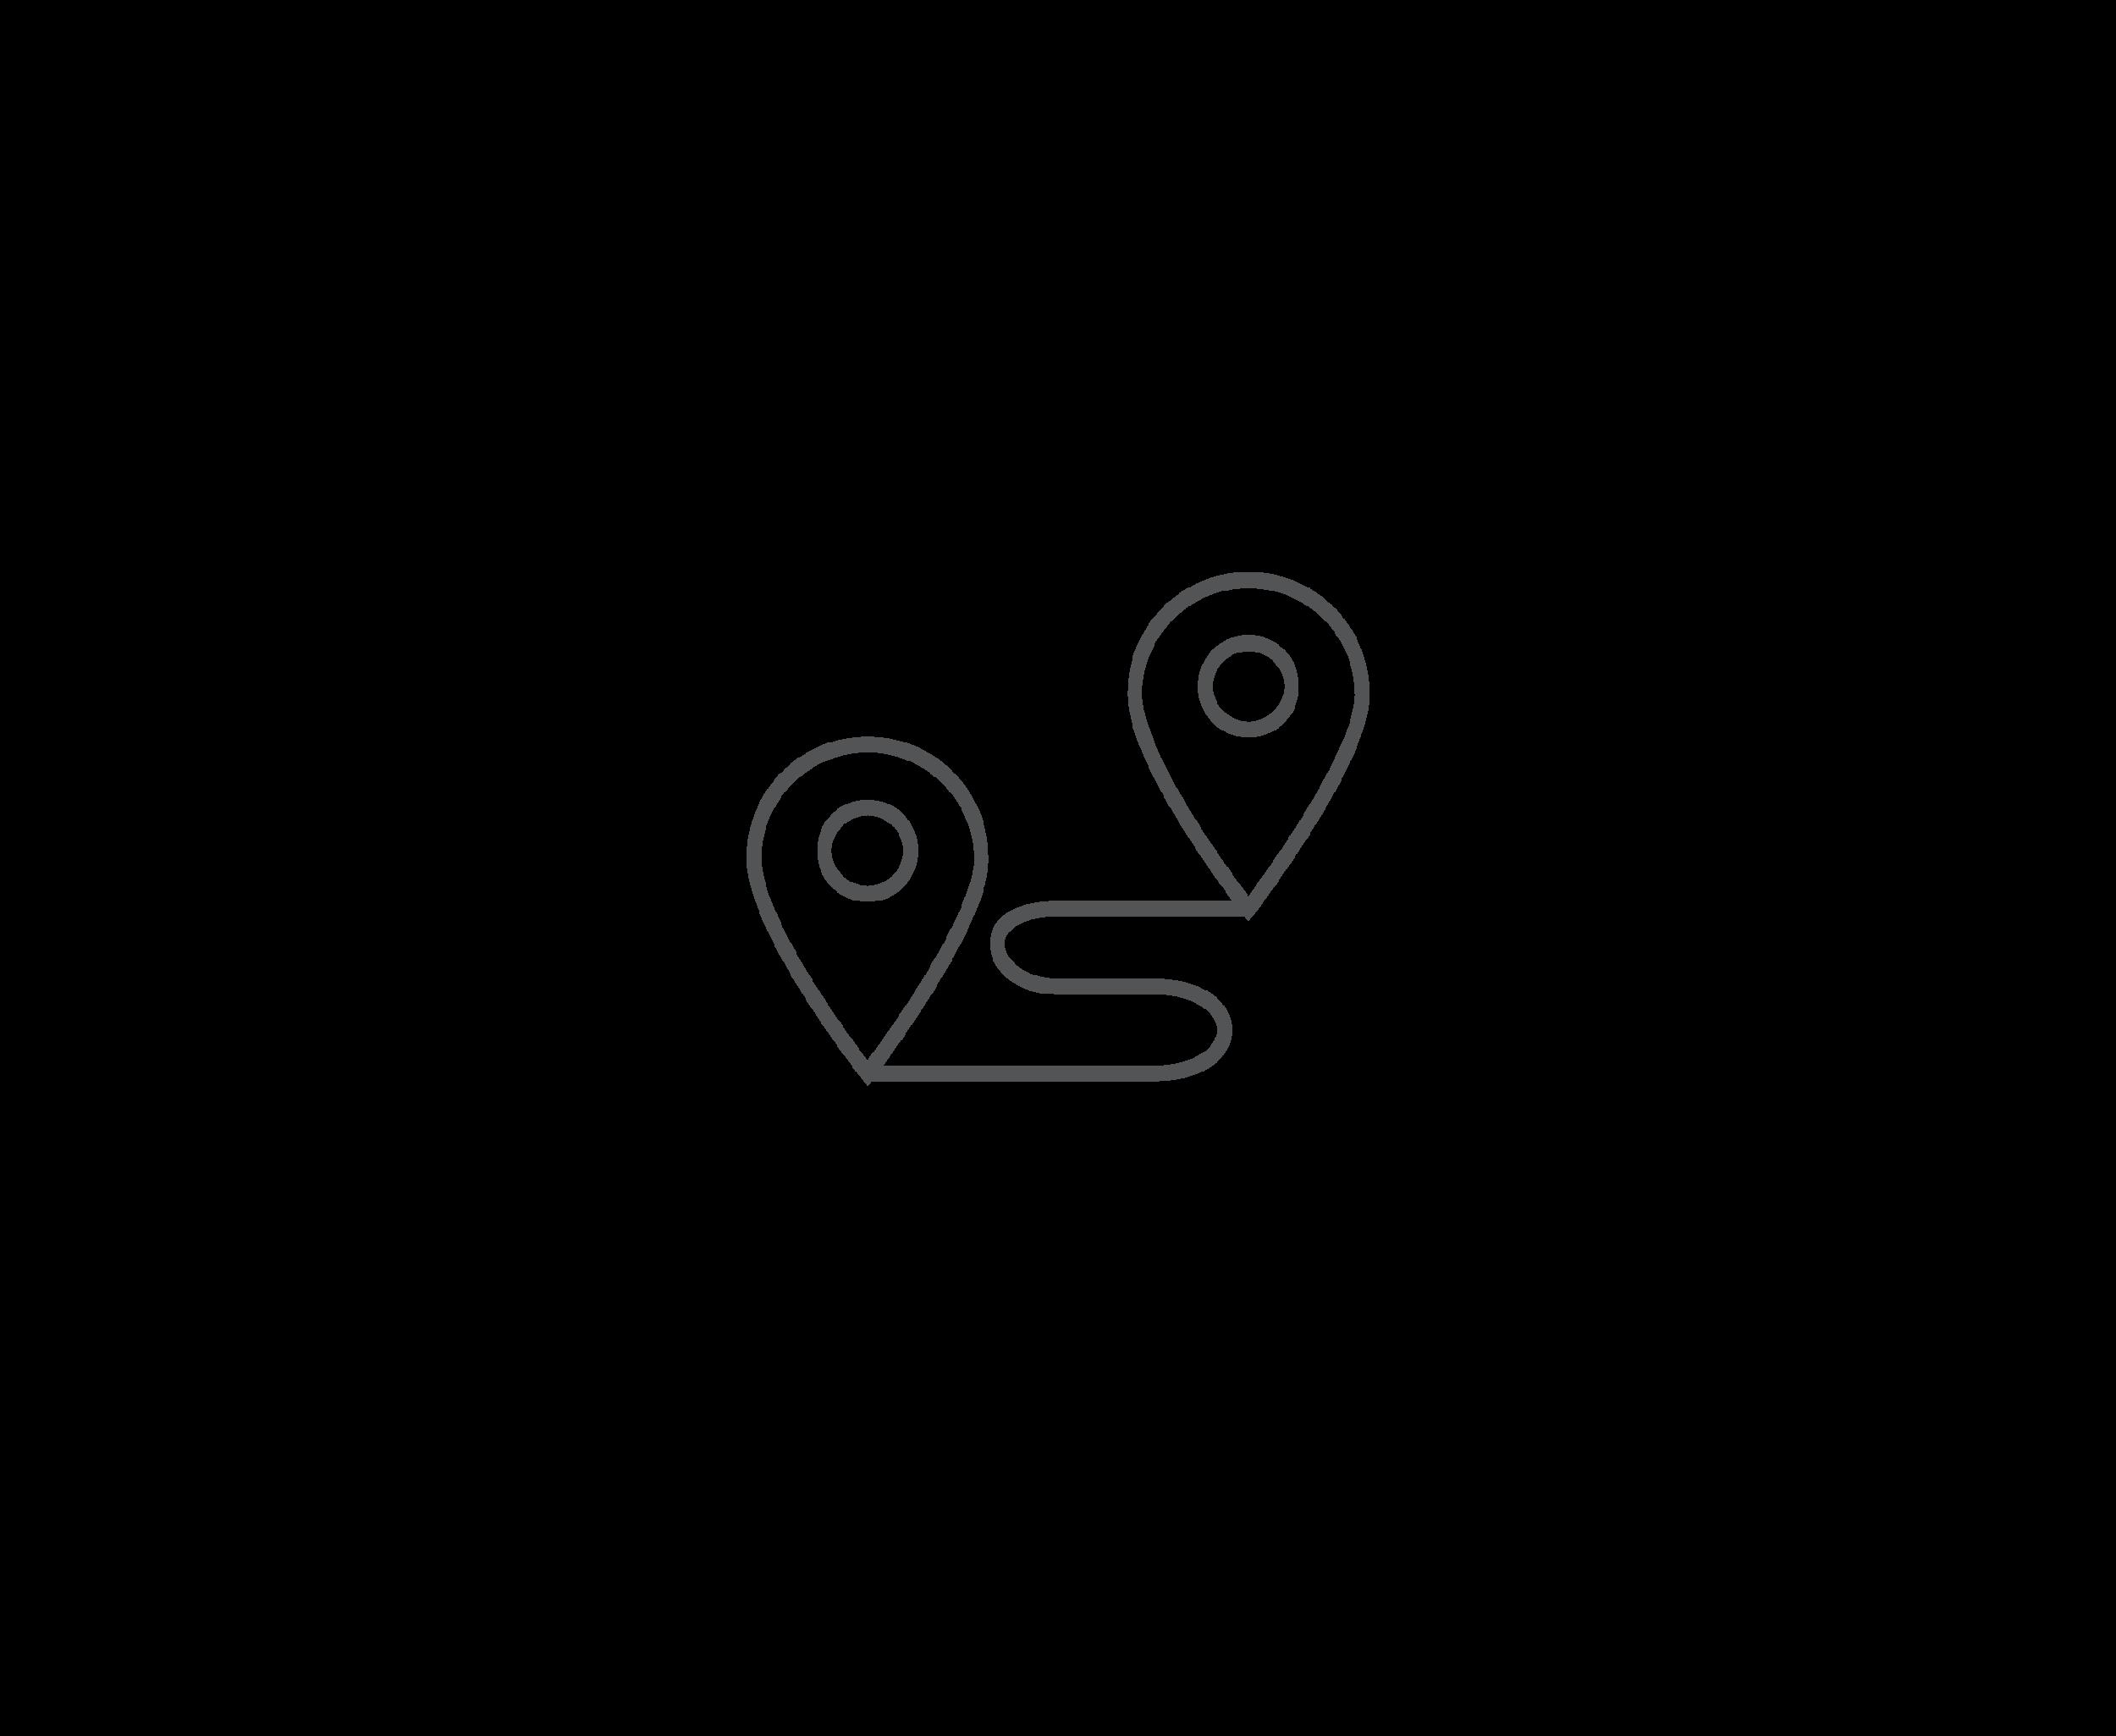 input illustrator-26.png